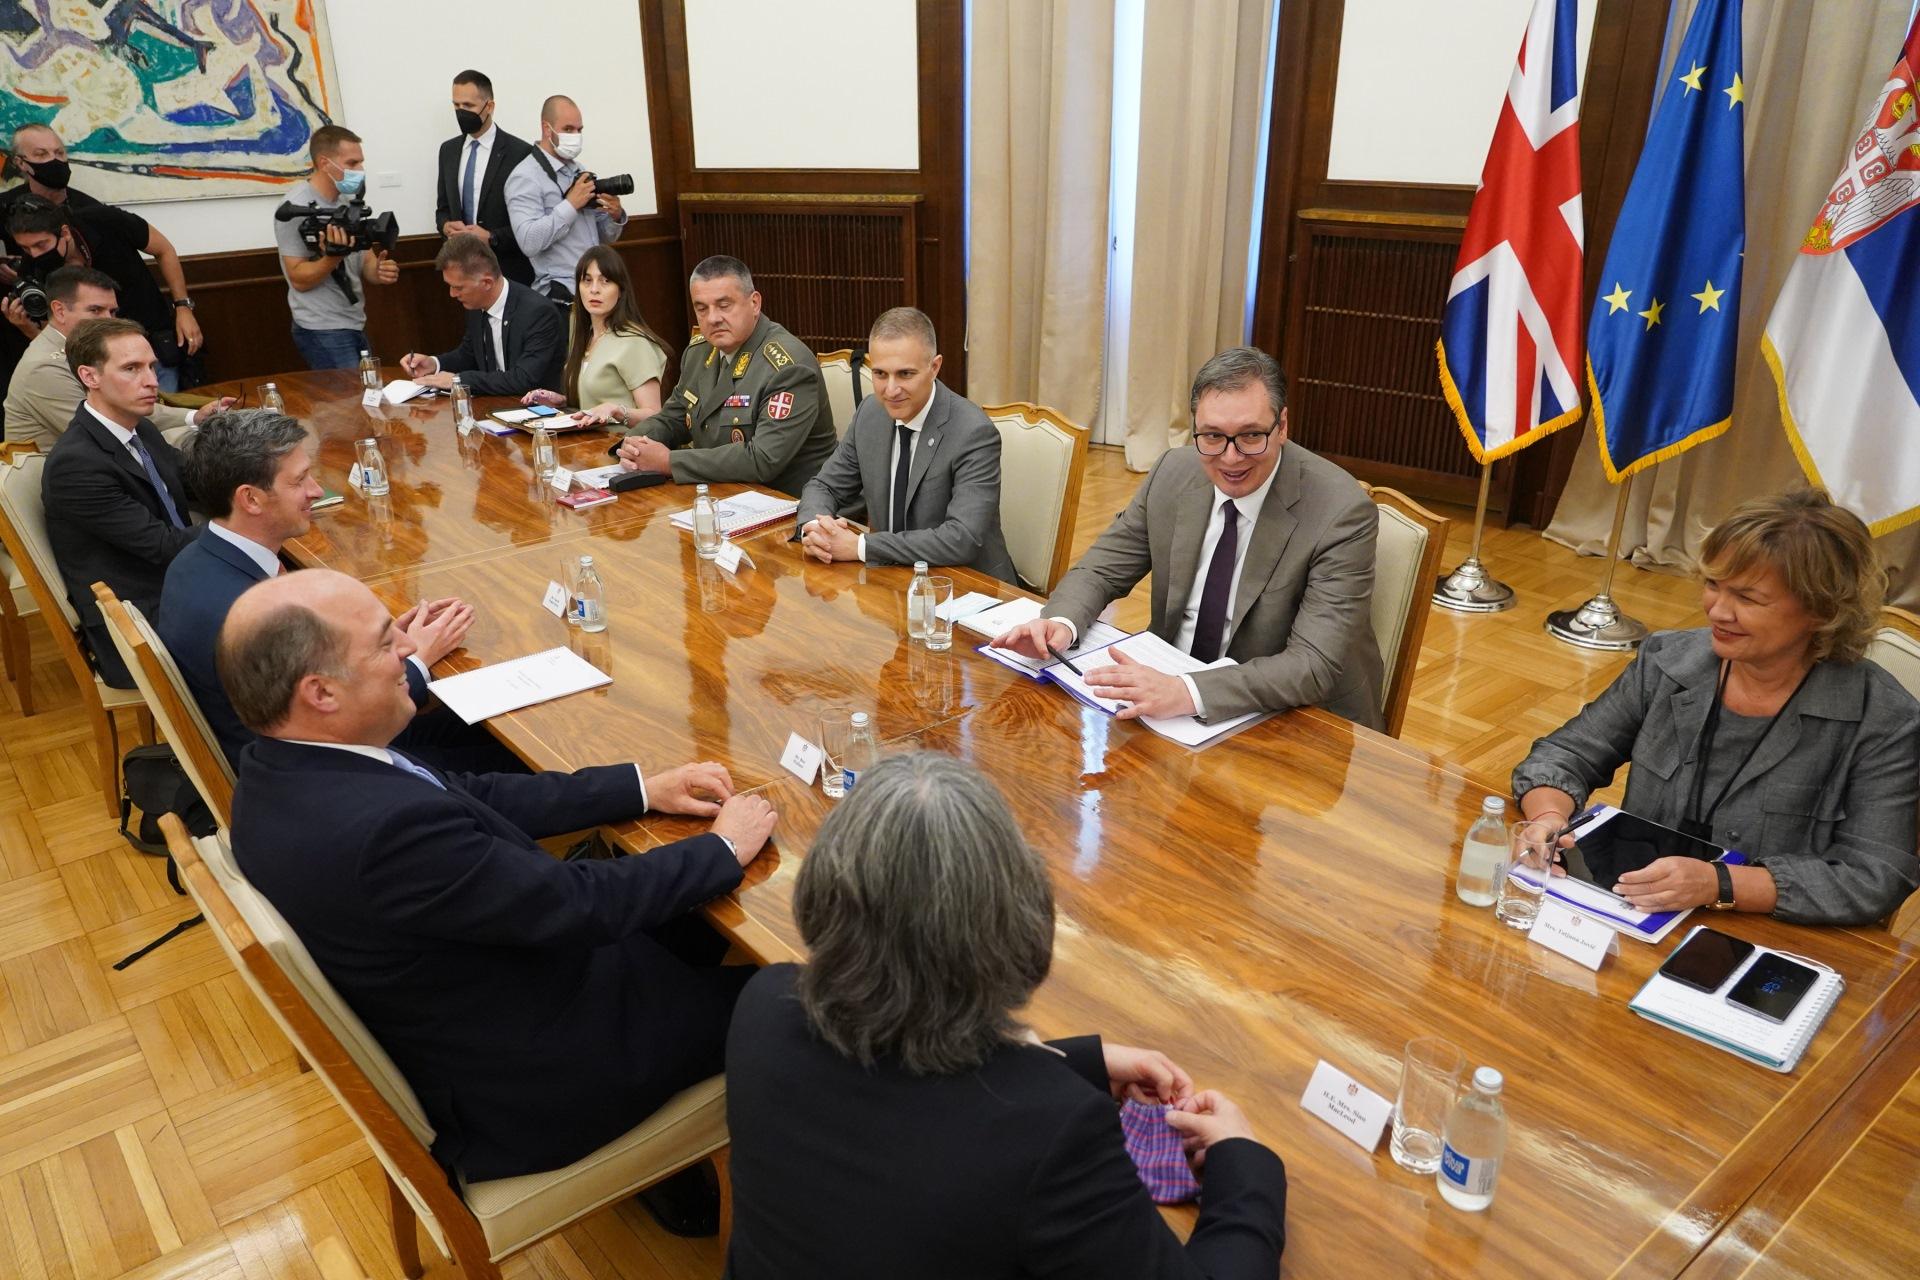 Predsednik Srbije Aleksandar Vucic razgovarao sa ministrom odbrane Ujedinjenog Kraljevstva